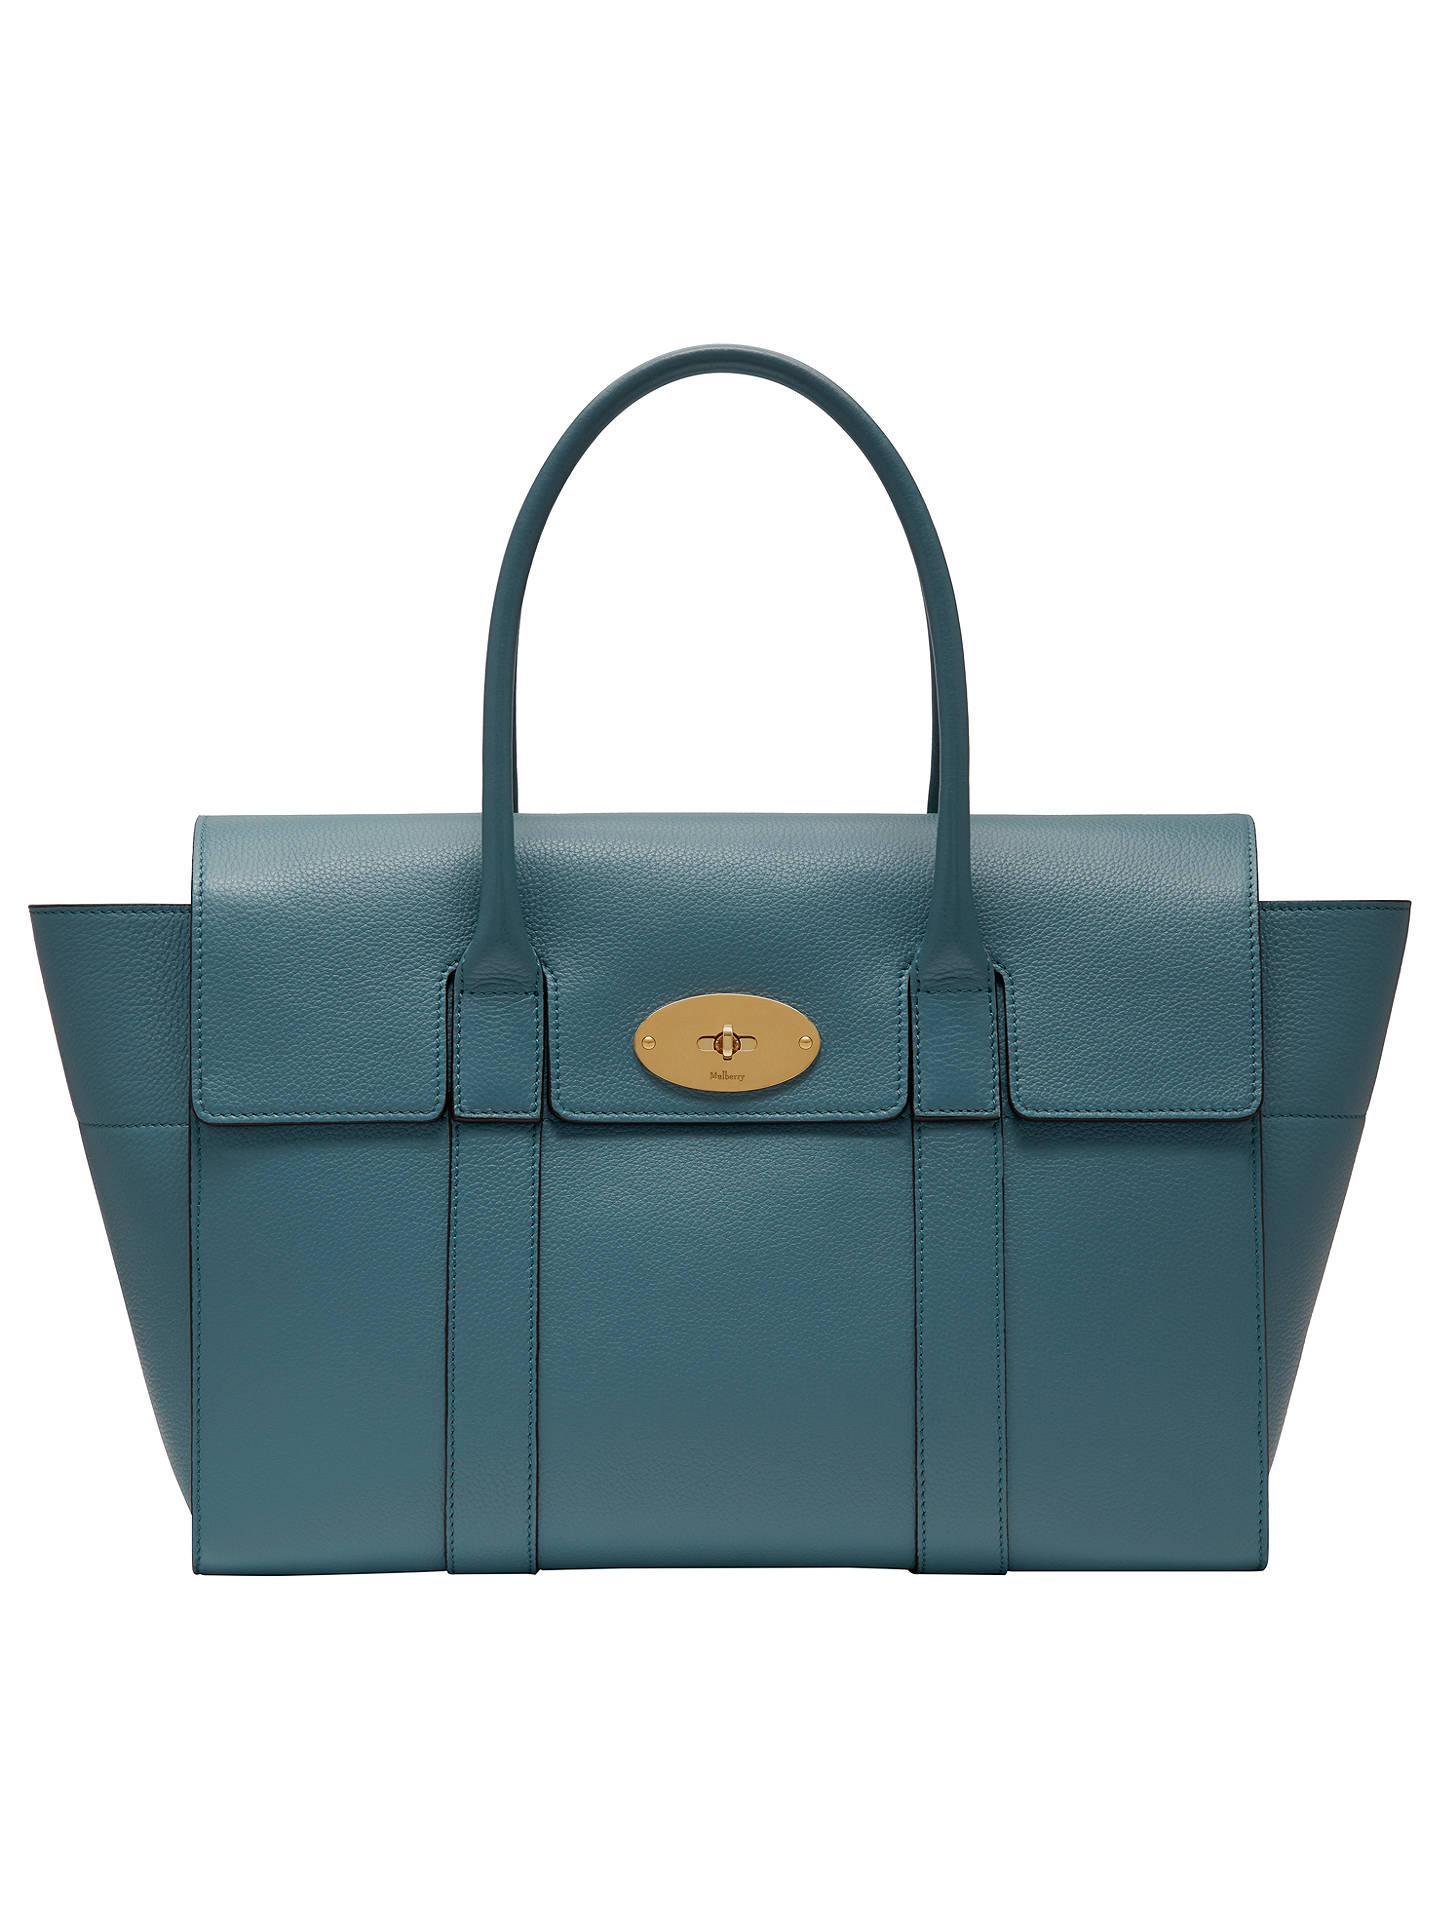 75a9e2309d7 Buy Mulberry Bayswater Grain Veg Tan Leather Bag, Dark Frozen Online at  johnlewis.com ...